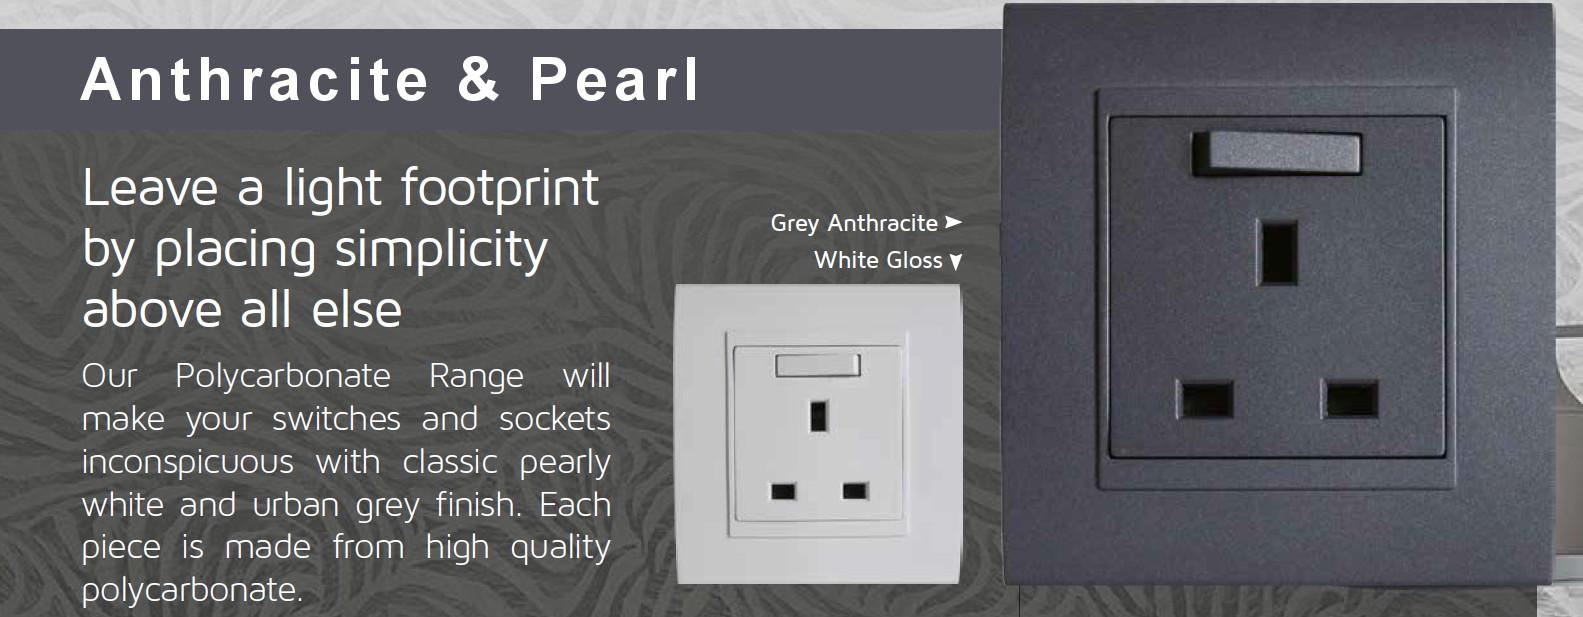 Anthracite & Pearl Range